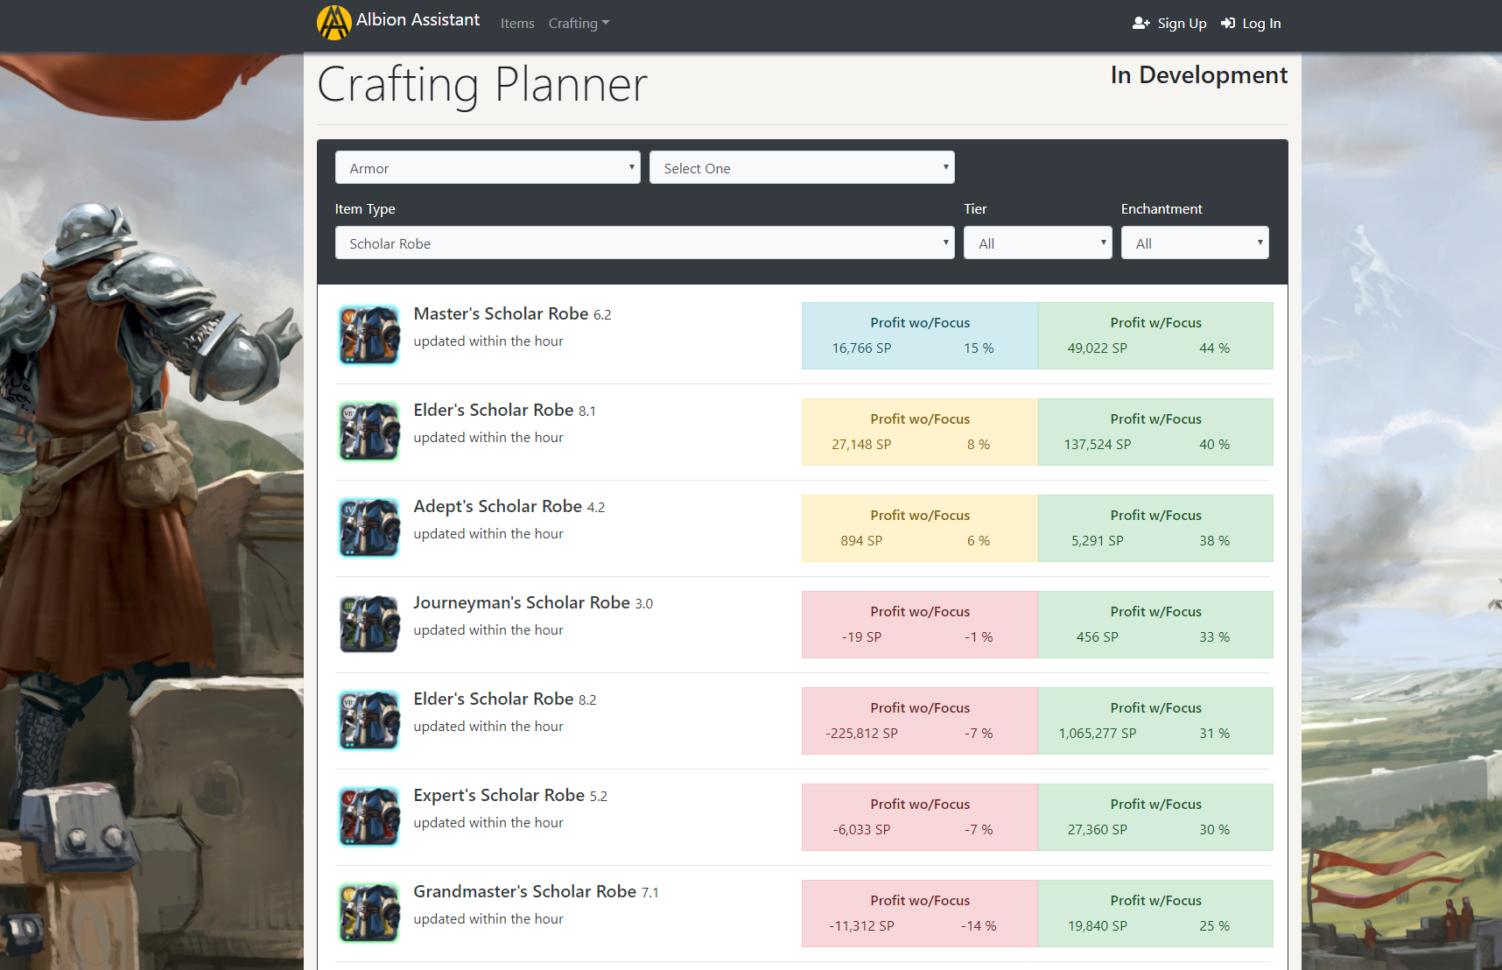 Albion Online Crafting Spreadsheet Inside Albion Online Crafting Planner : Albiononline